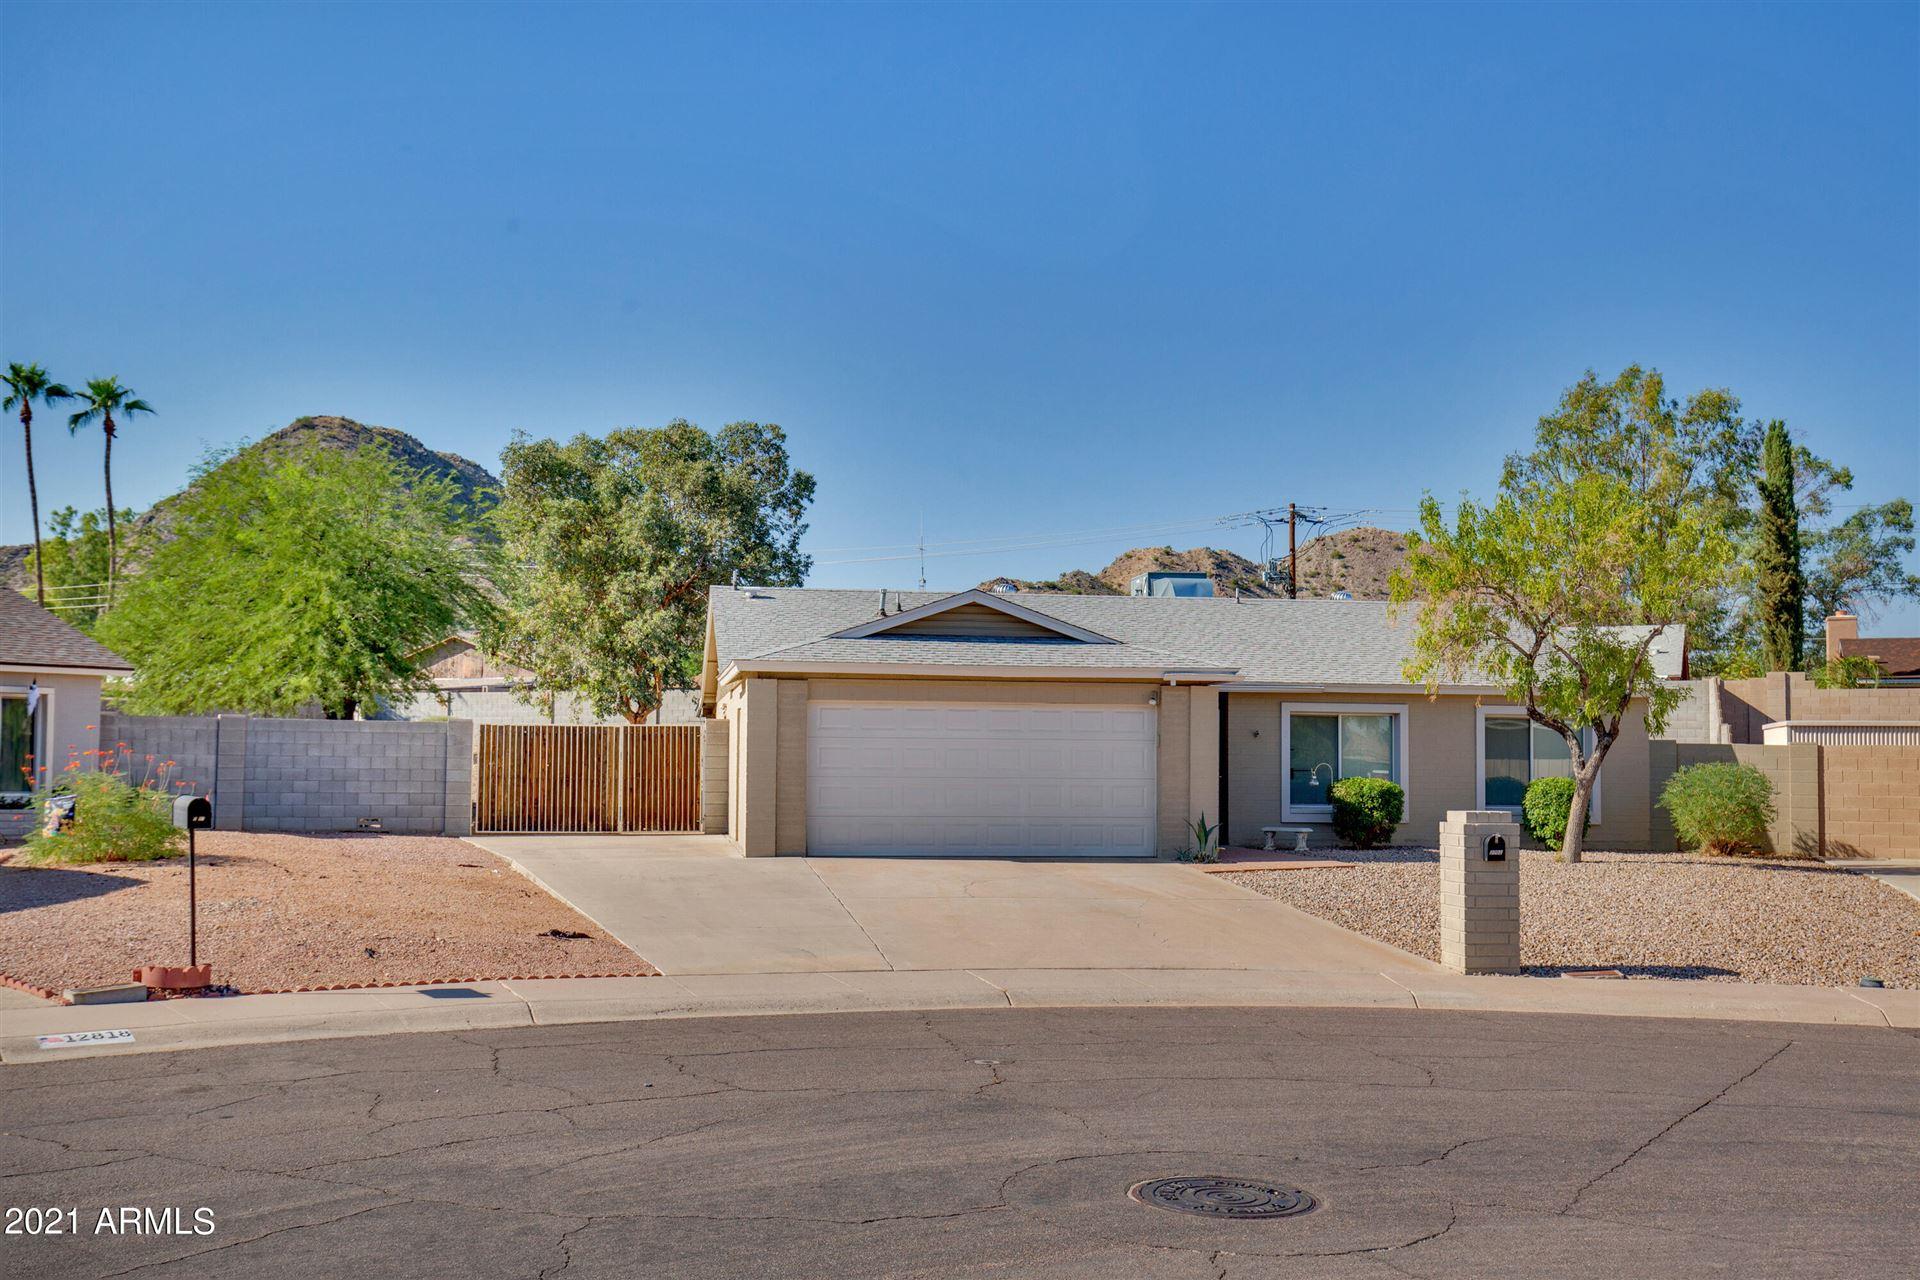 2702 E DAHLIA Drive, Phoenix, AZ 85032 - MLS#: 6297650